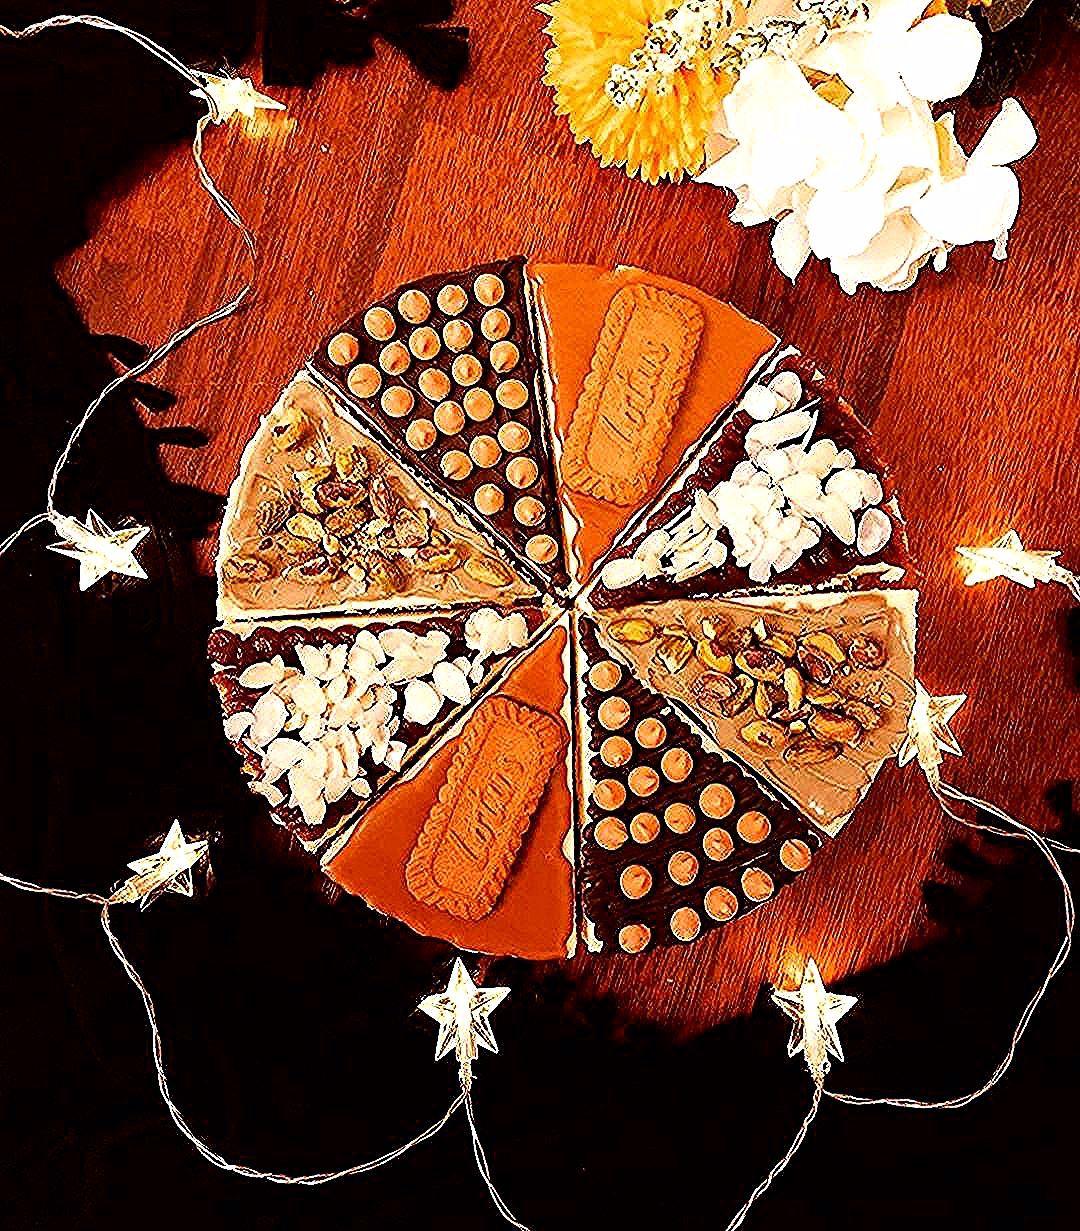 Yummy My Cheesecake ميكس تشيز كيك مقاس9 انش النكهات لوتس بستاشيو تمر شوكولا Baby Food Pistachio Fo Artwork Abstract Artwork Abstract